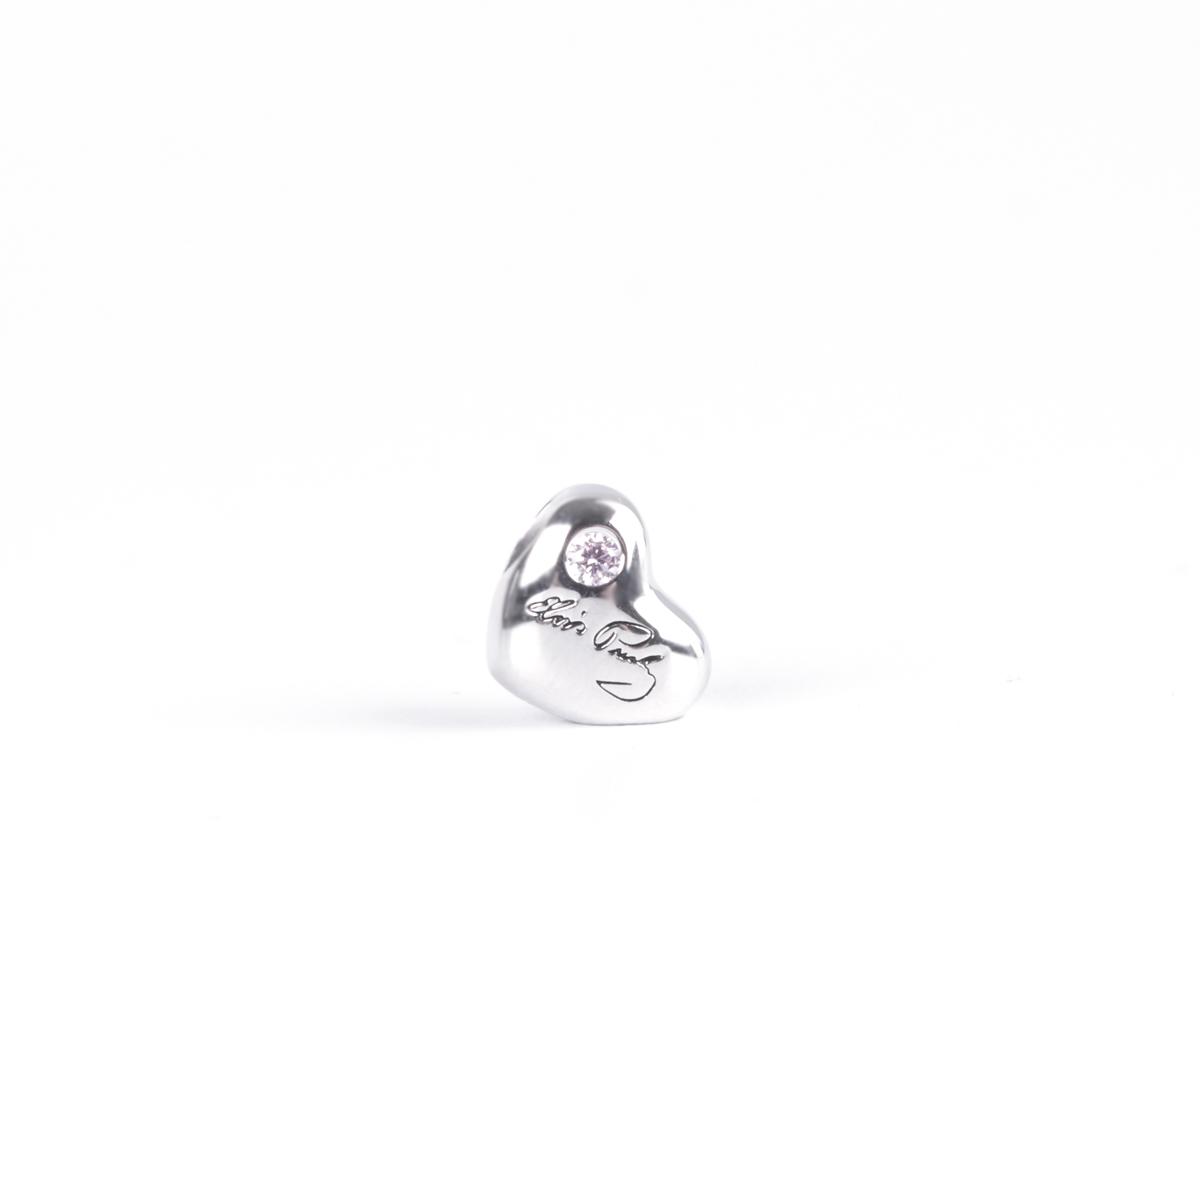 Elvis Silver Charm - Signature Heart Bead